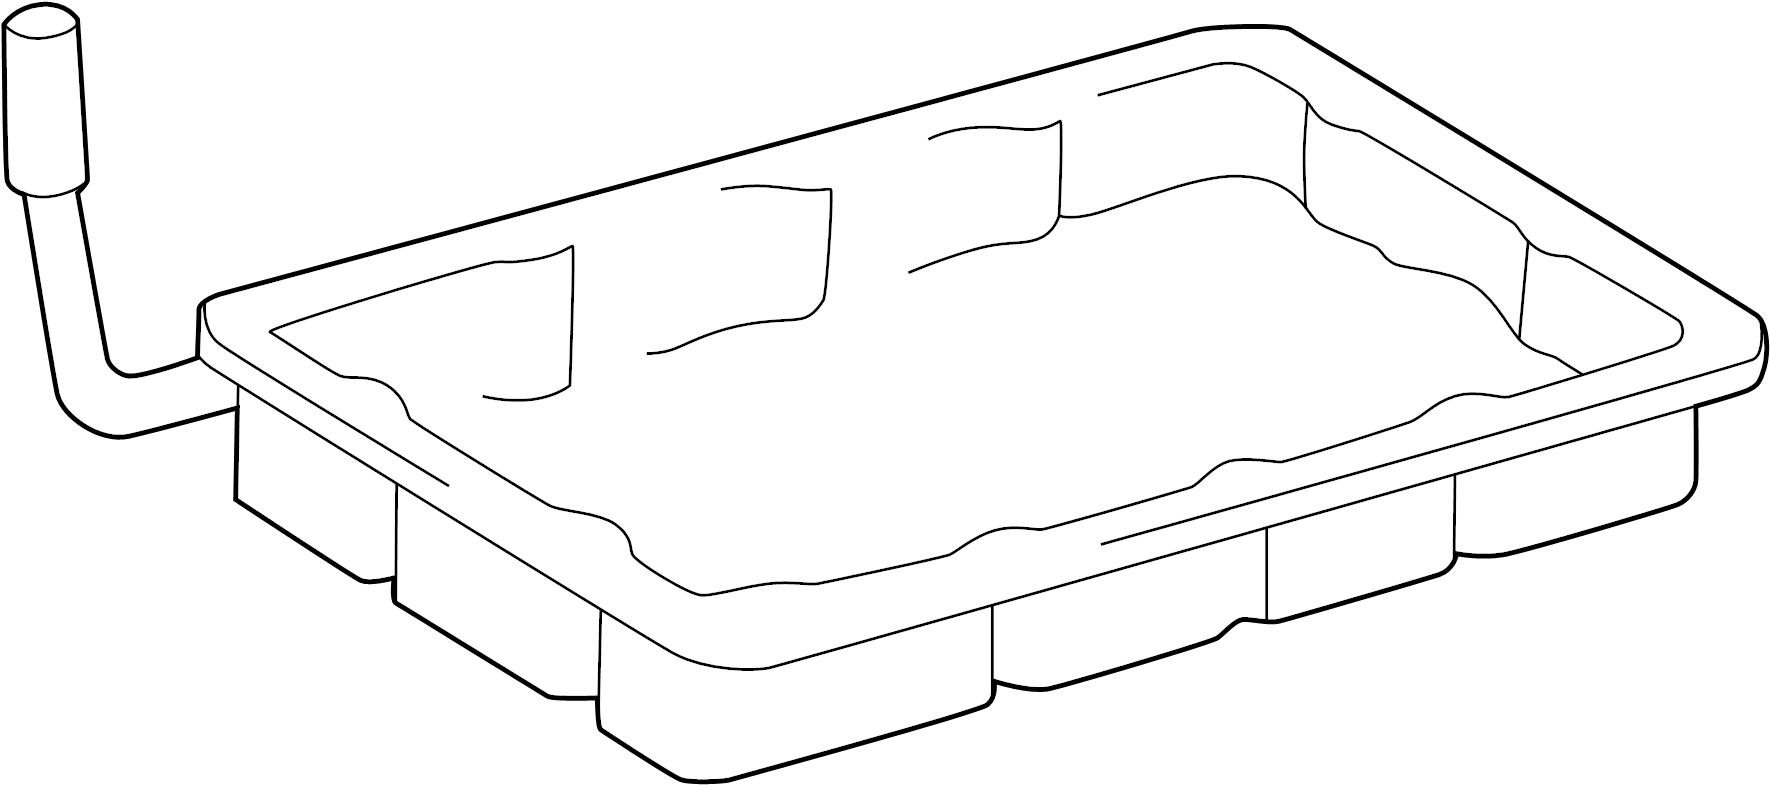 2004 Mazda Automatic Transmission Oil Pan. Maintenance